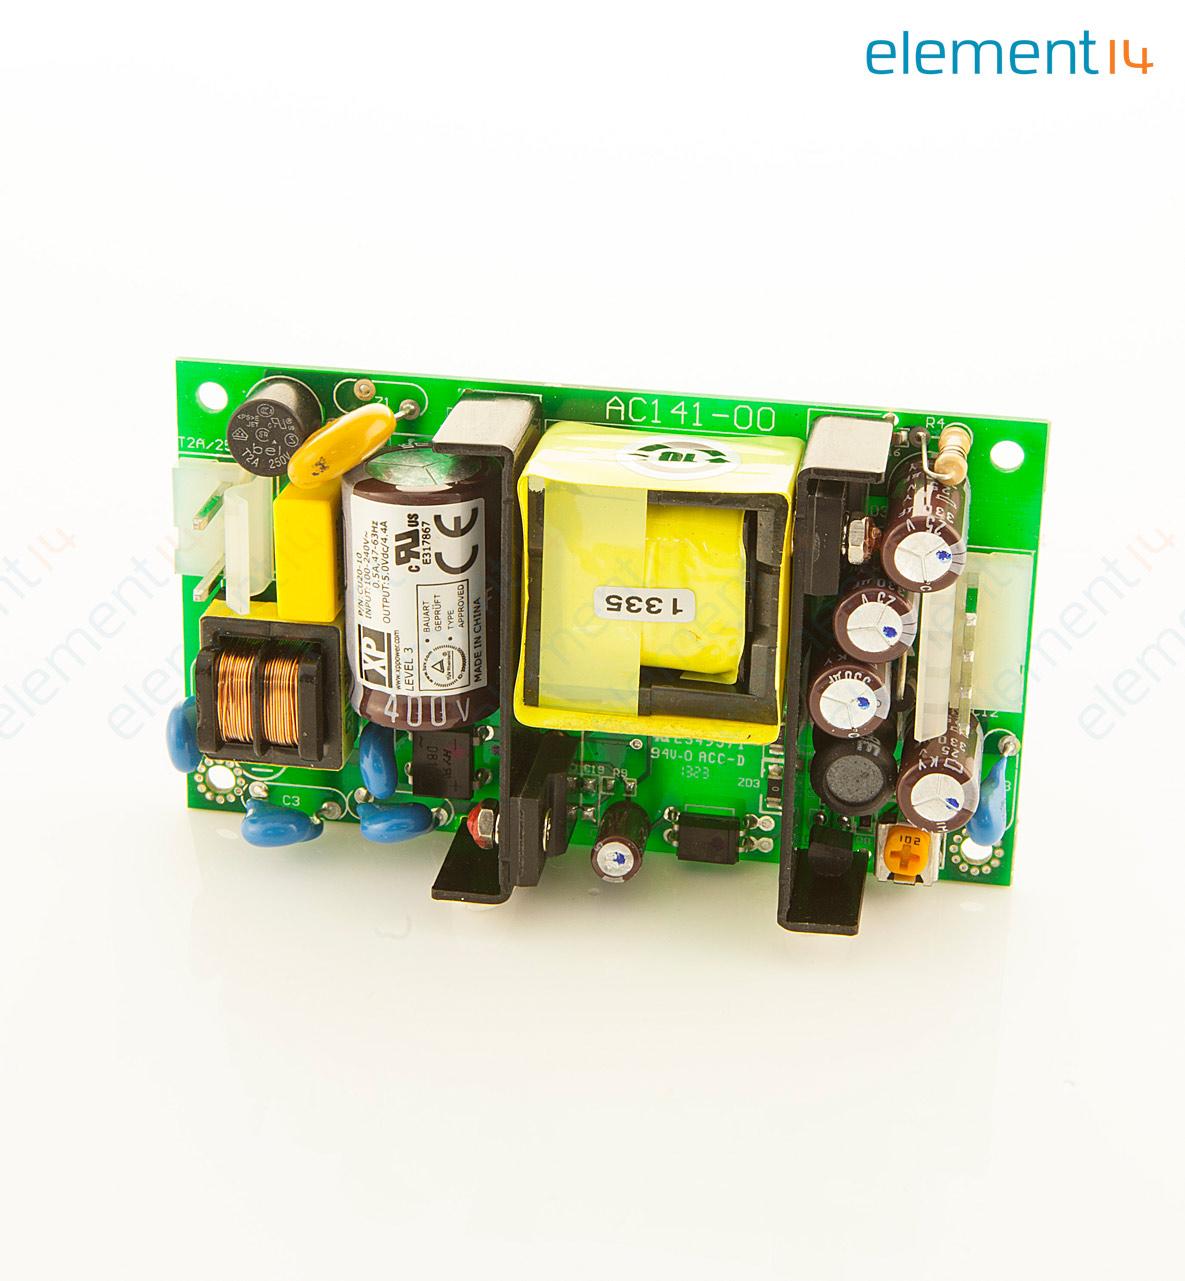 AC/DC PCB Mount Power Supply (PSU), ITE, 1 Output, 20 W, 5 V, 4 4 A